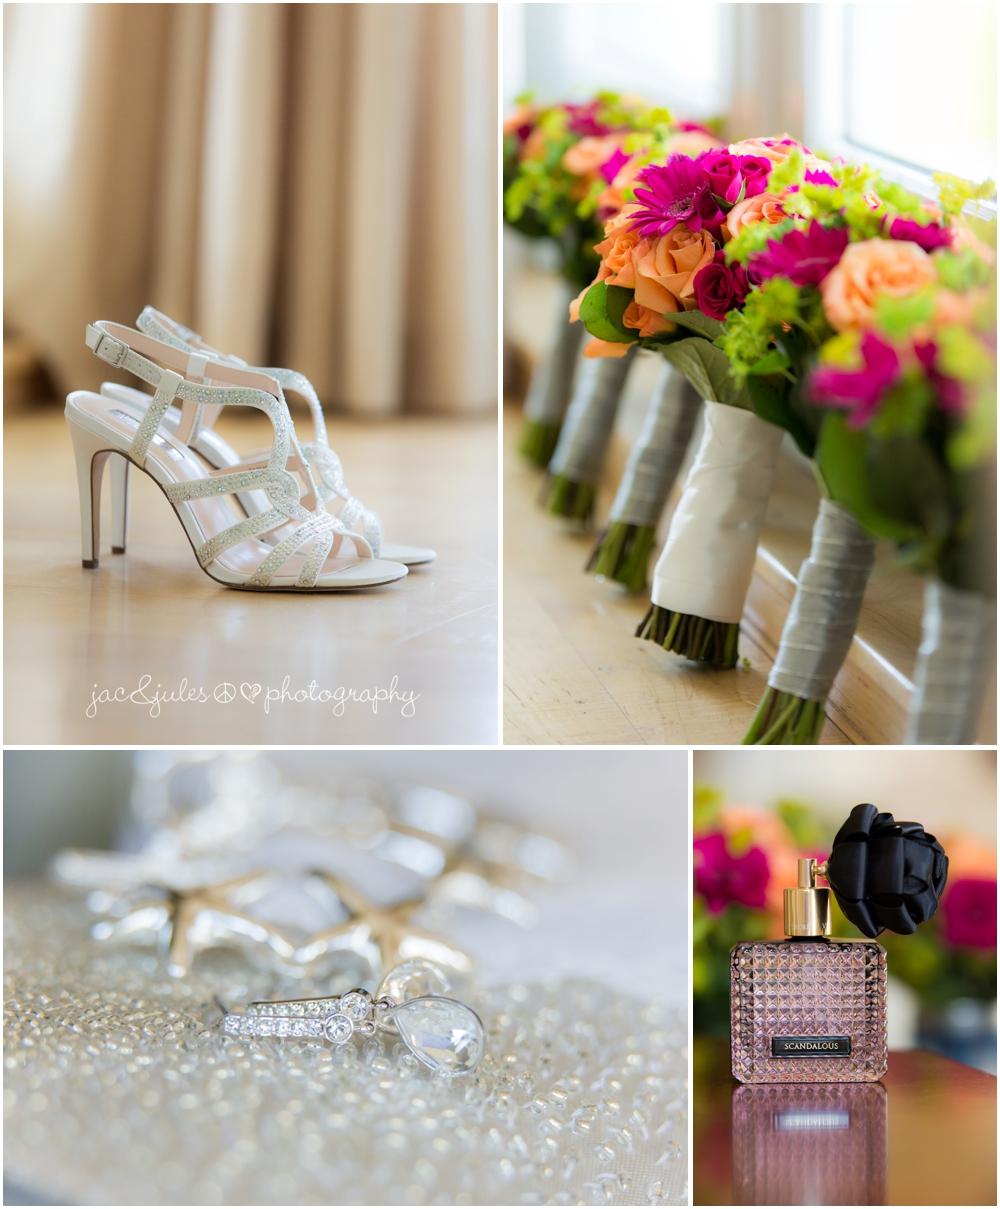 bonnet-island-estate-wedding-photos.jpg_0001.jpg